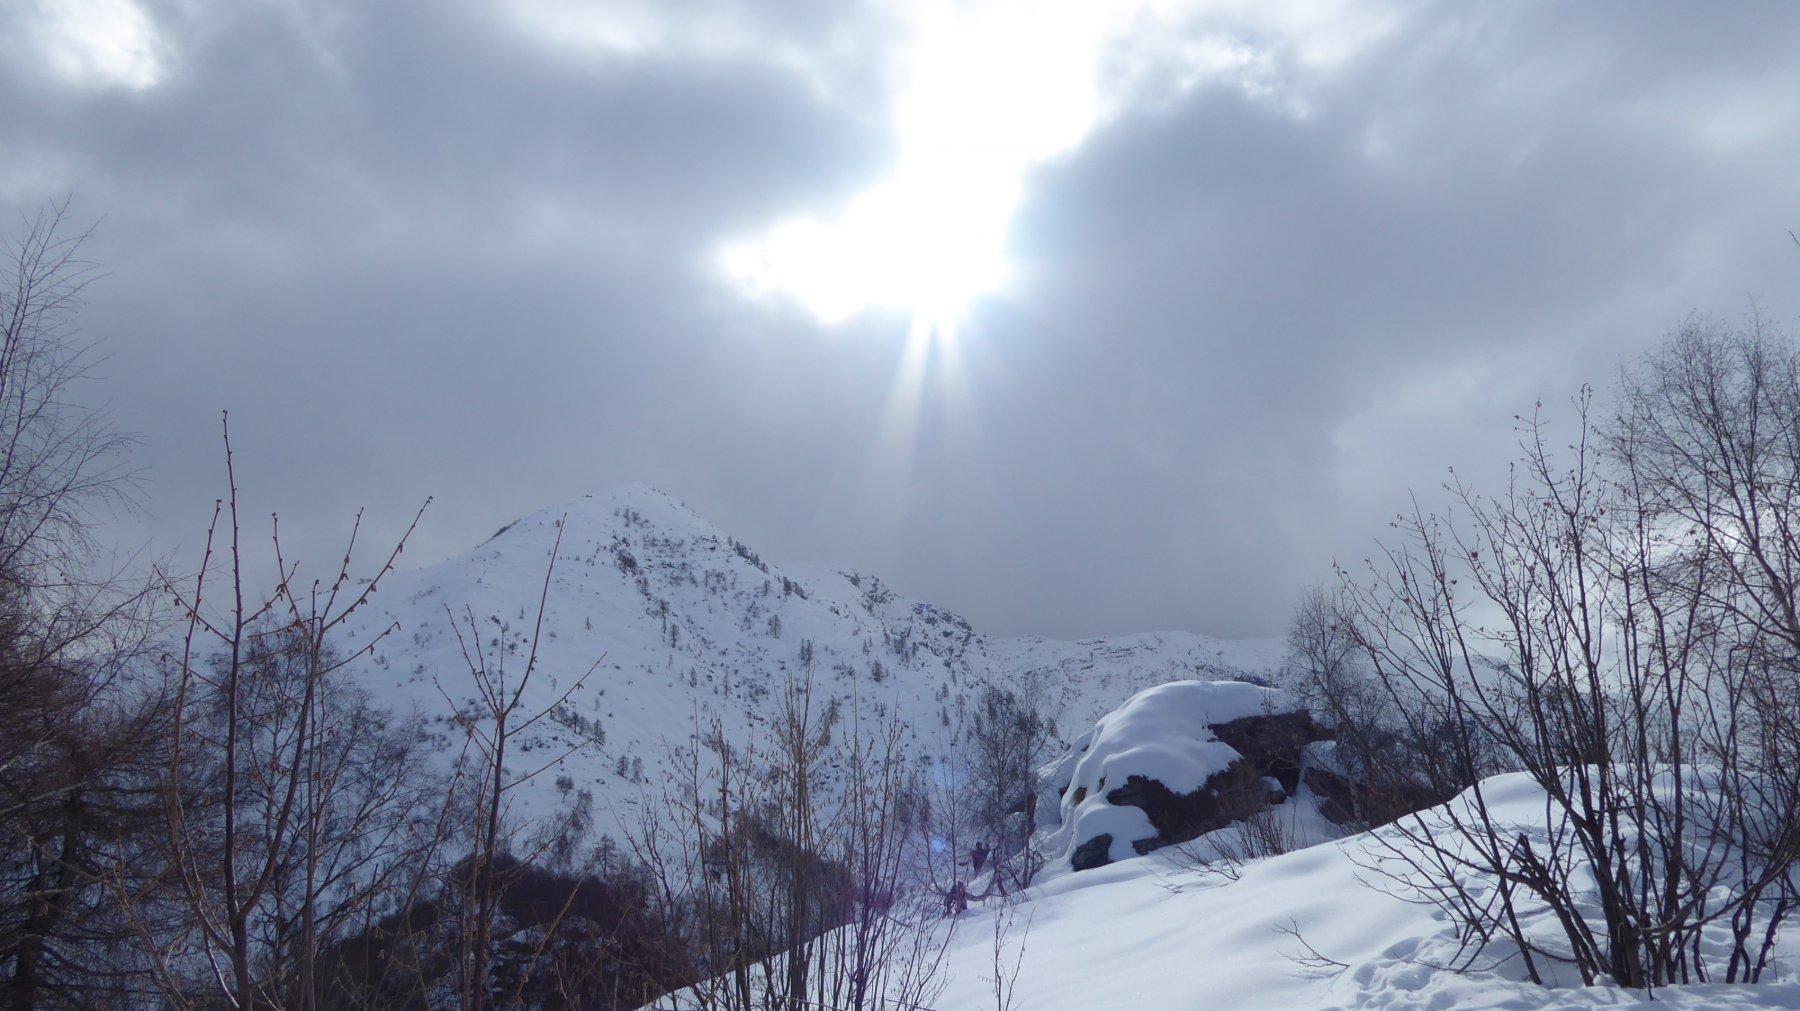 Arrivo al Der del Mont